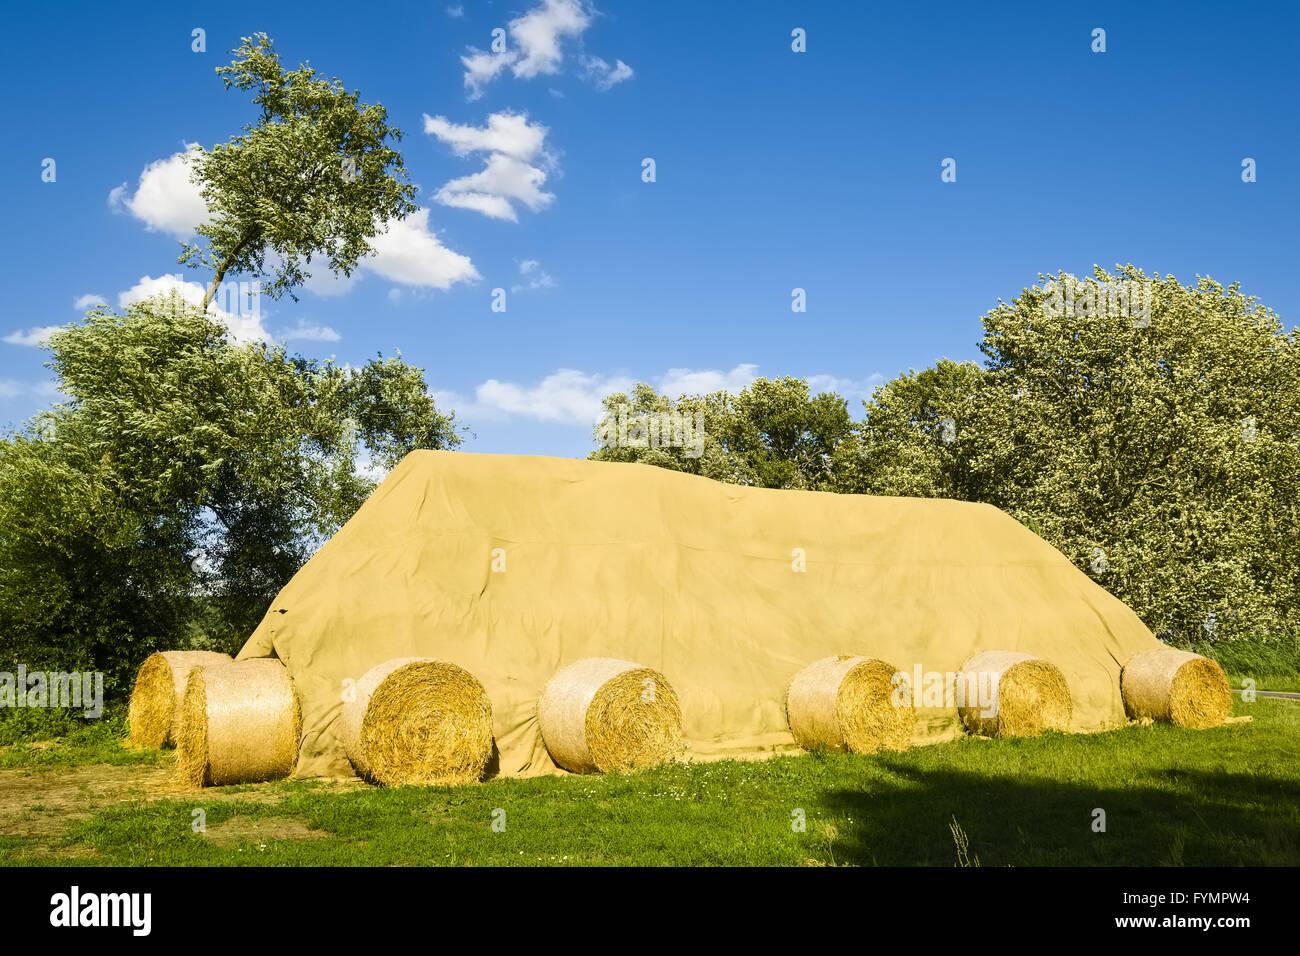 Covered stack of straw bales, Brandenburg, Germany - Stock Image